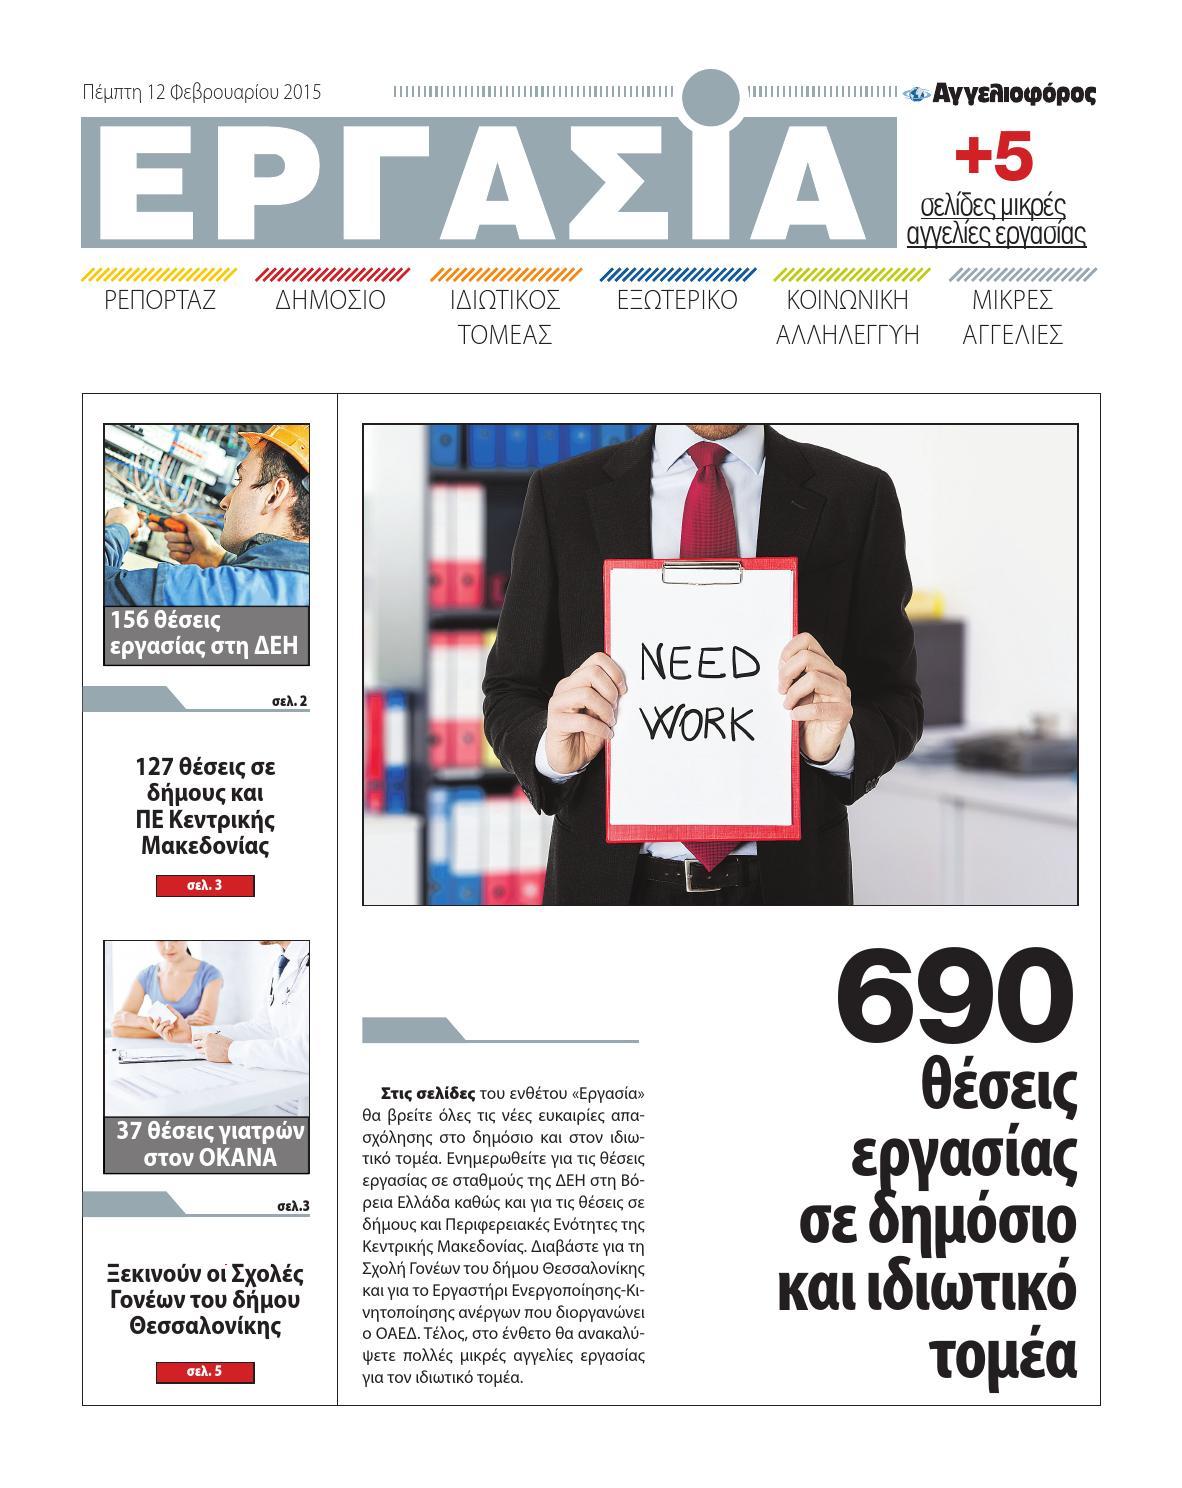 7d2d994a83ab Εργασία 12 02 2015 by Εκδοτική Βορείου Ελλάδος Α.Ε. - issuu